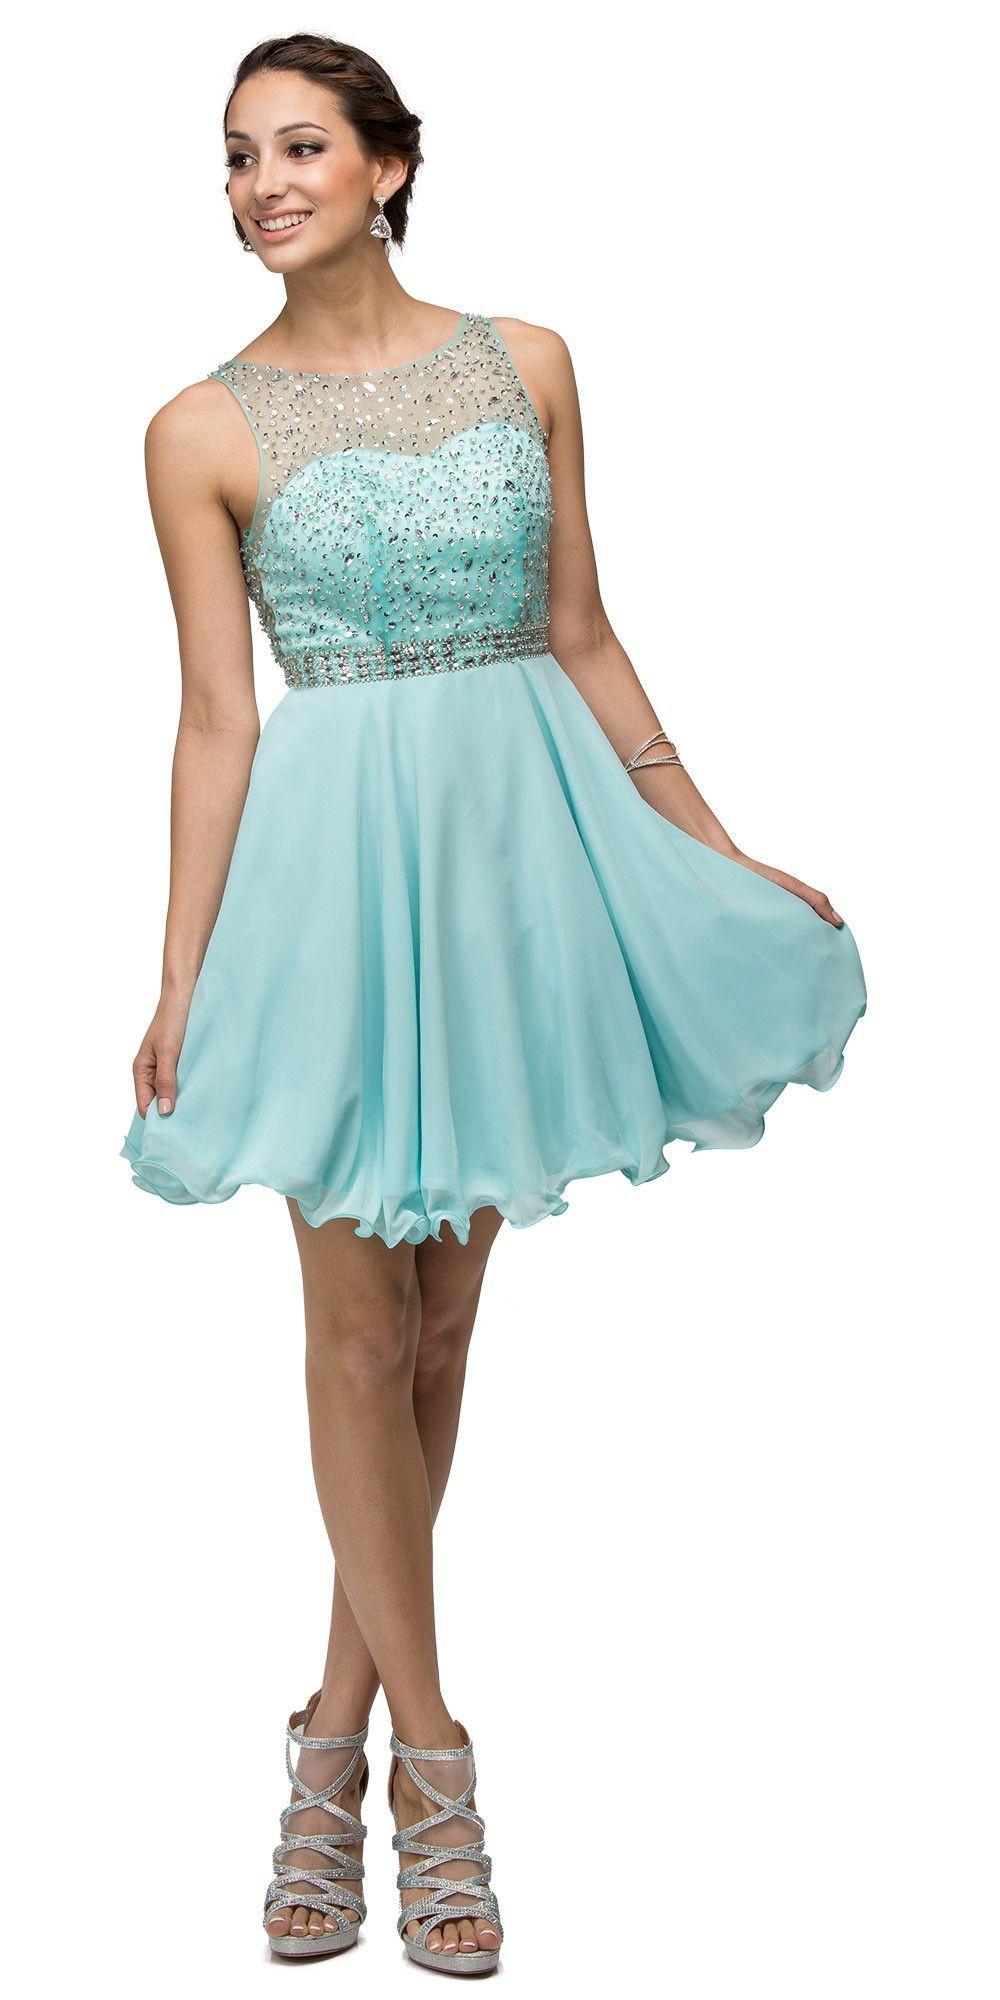 Blush boat neck sheer beaded back illusion homecoming dress